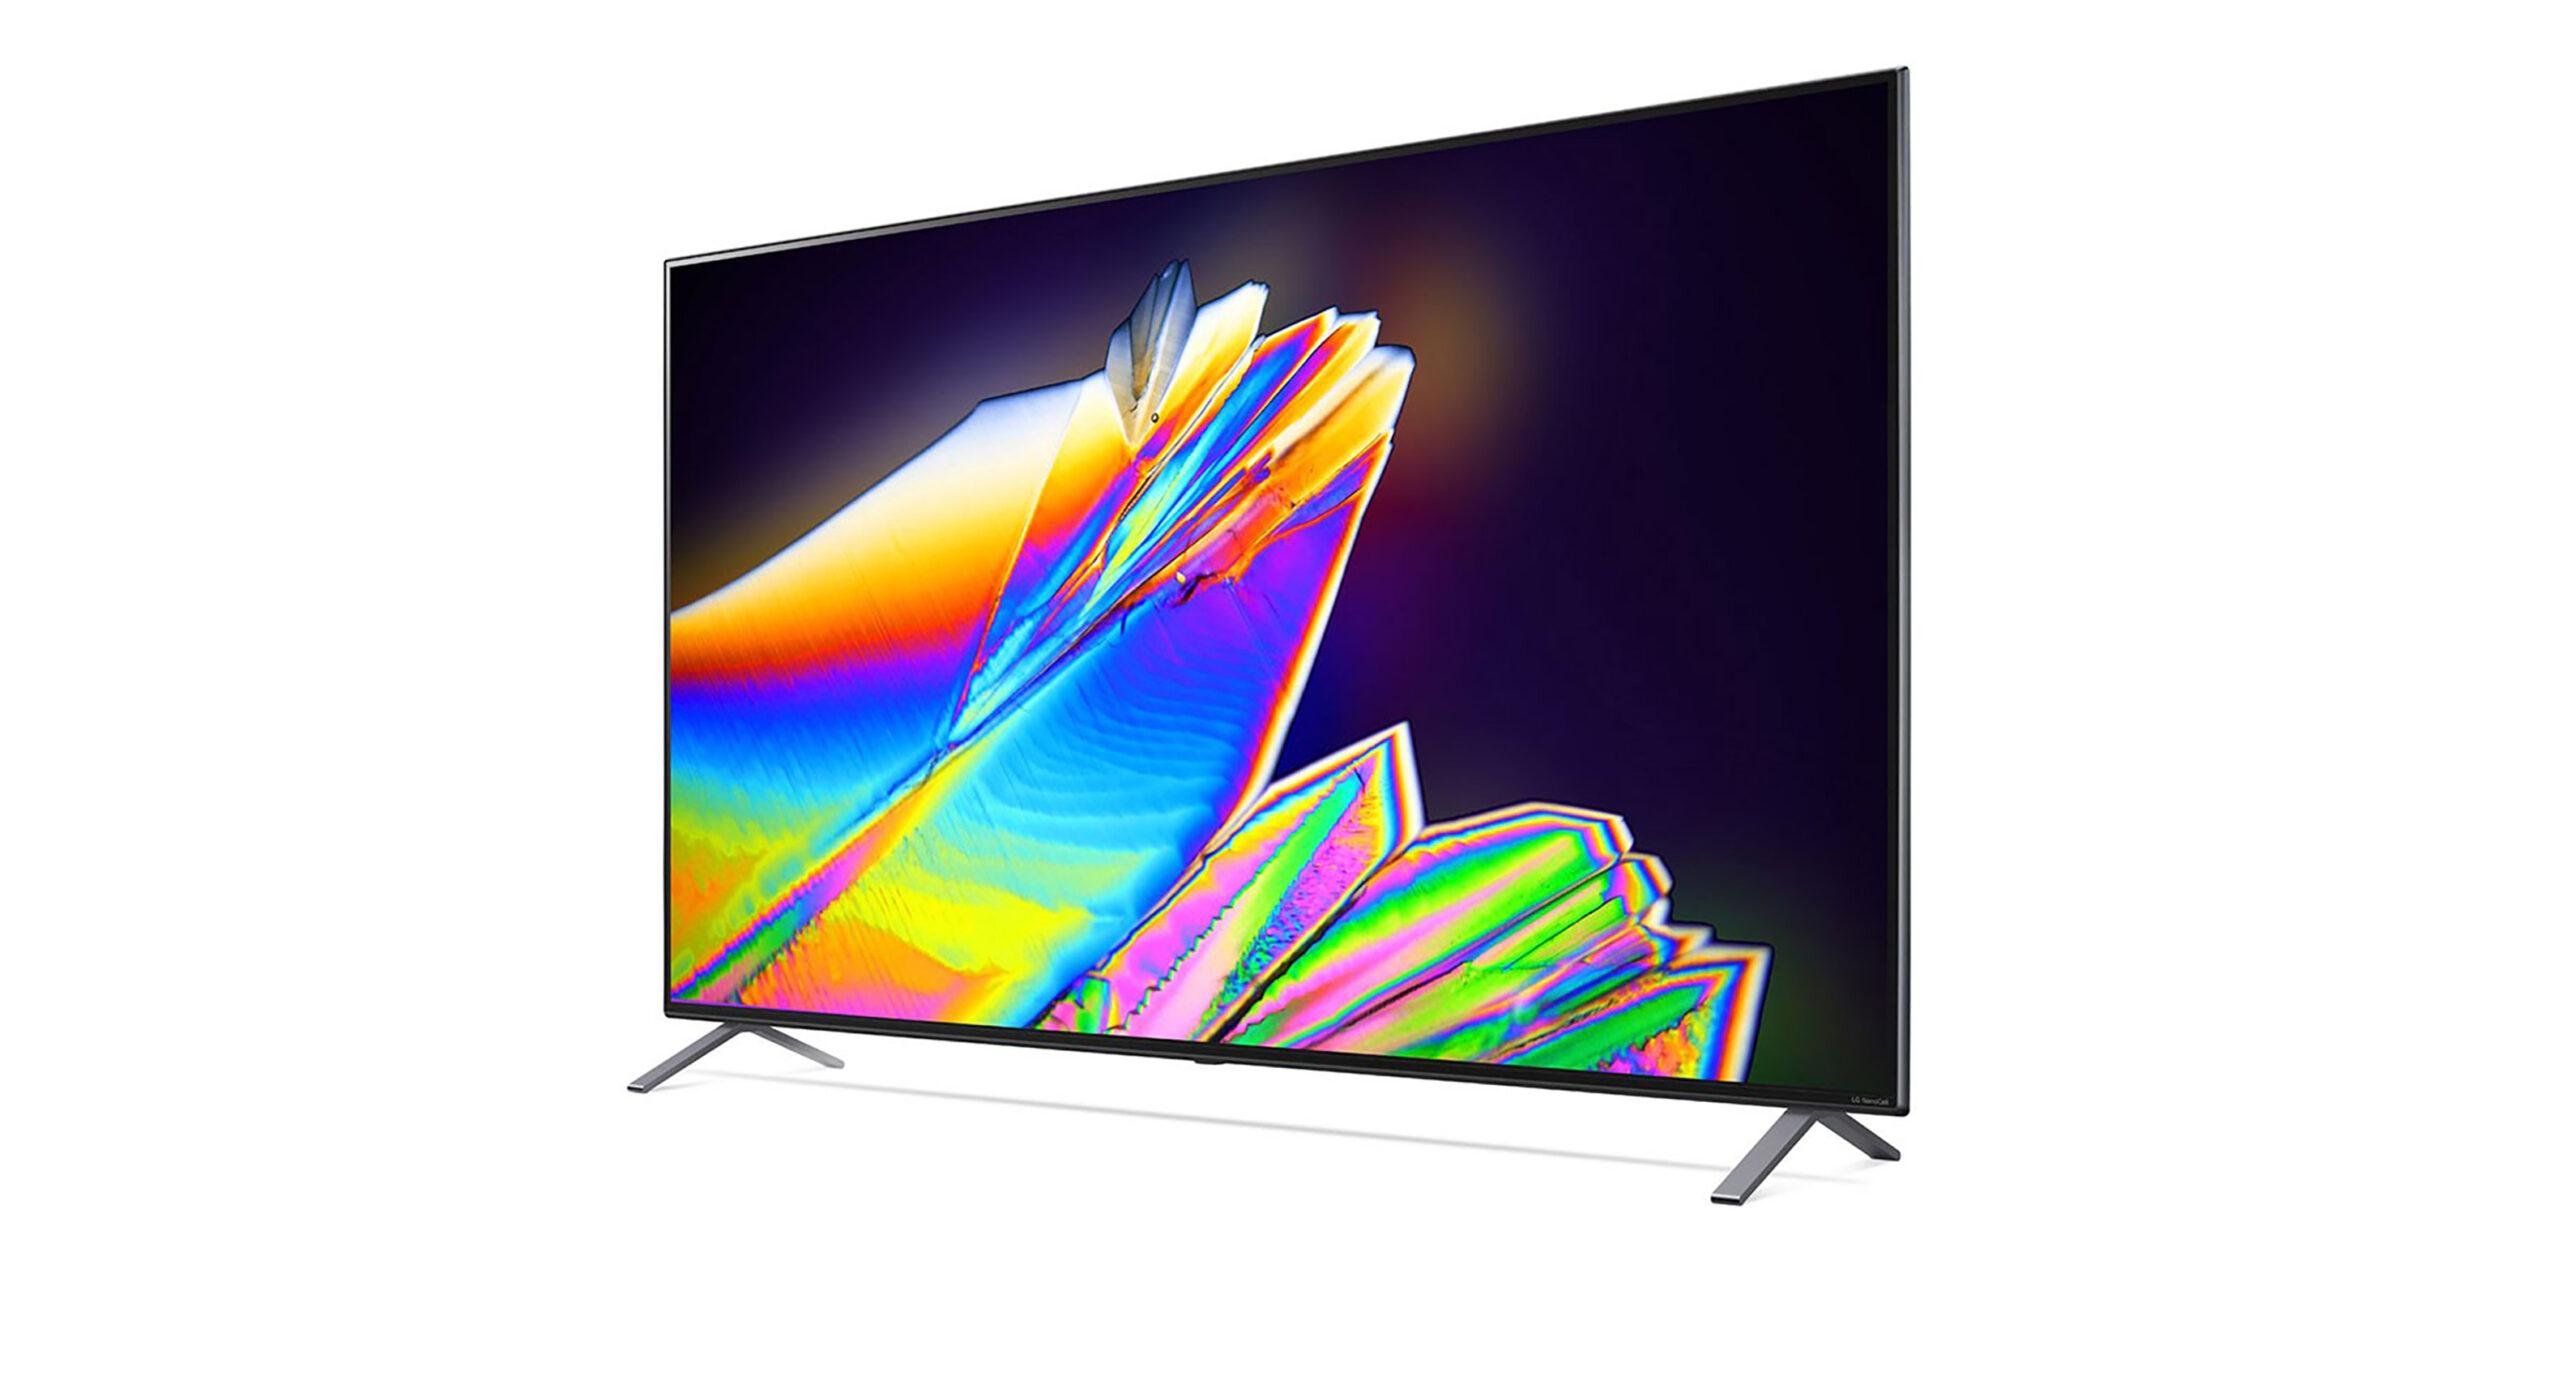 LG Nanocell television